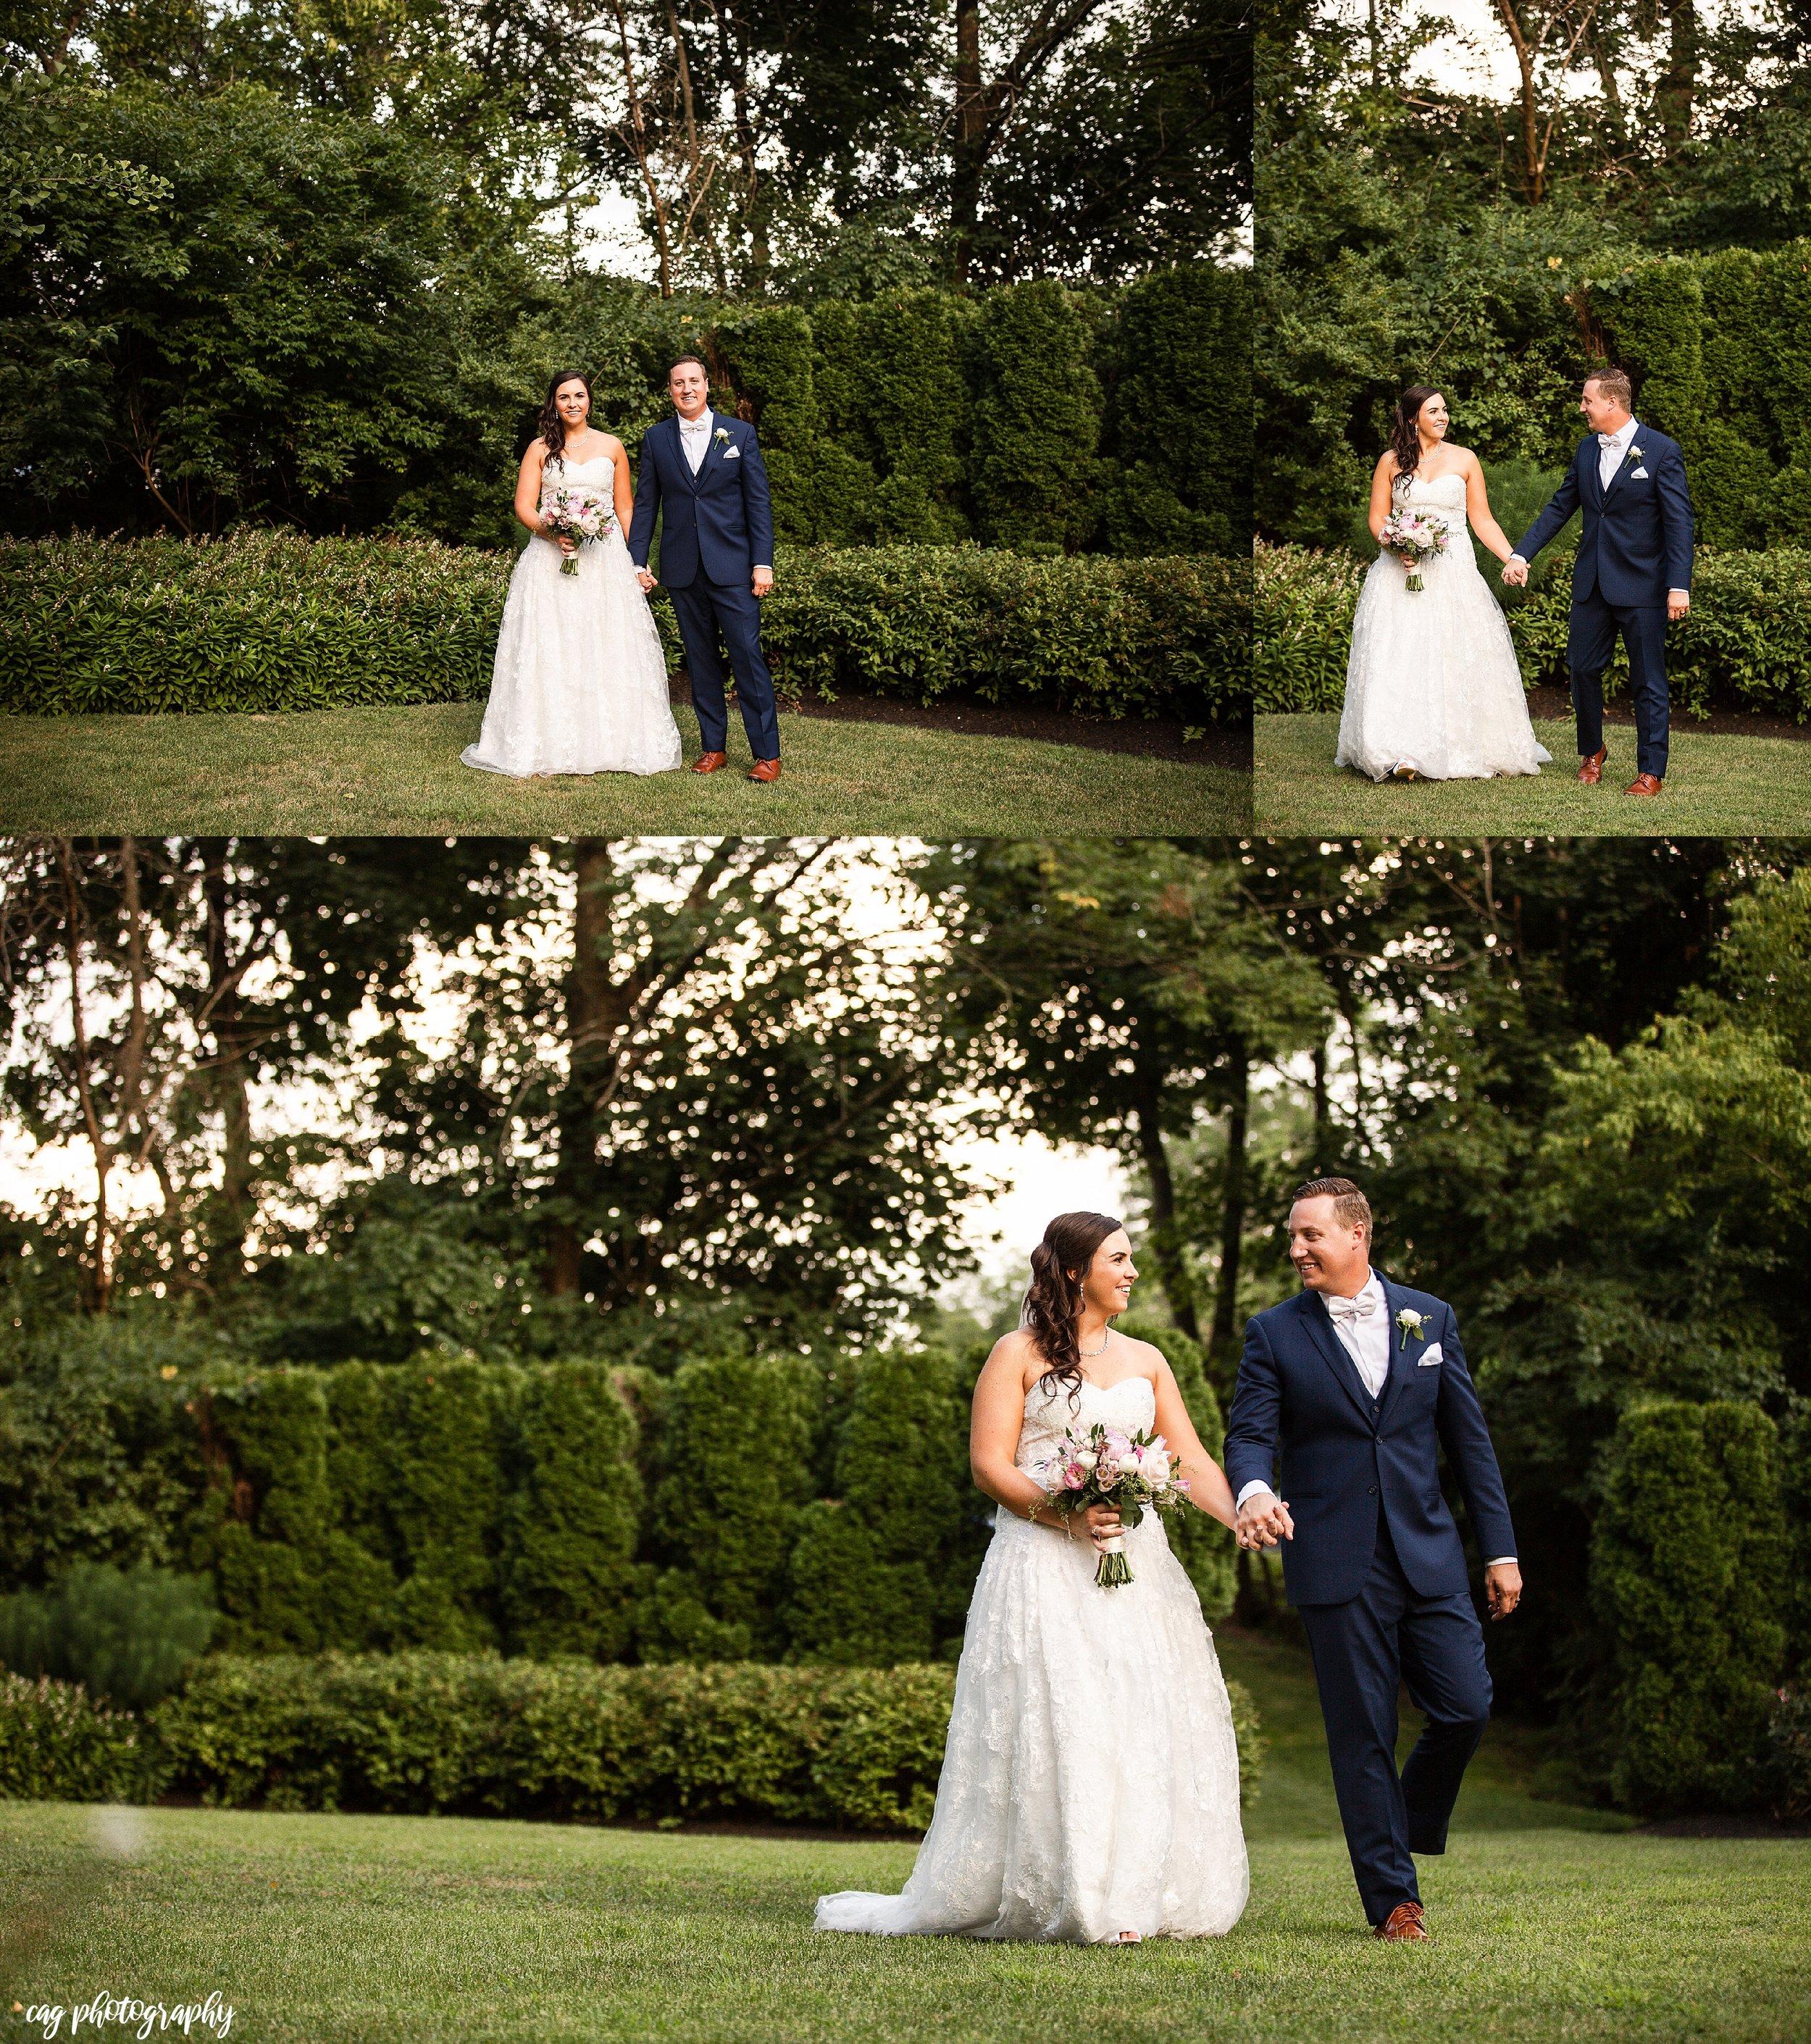 Kristie+Andrew MARRIED-640.jpg